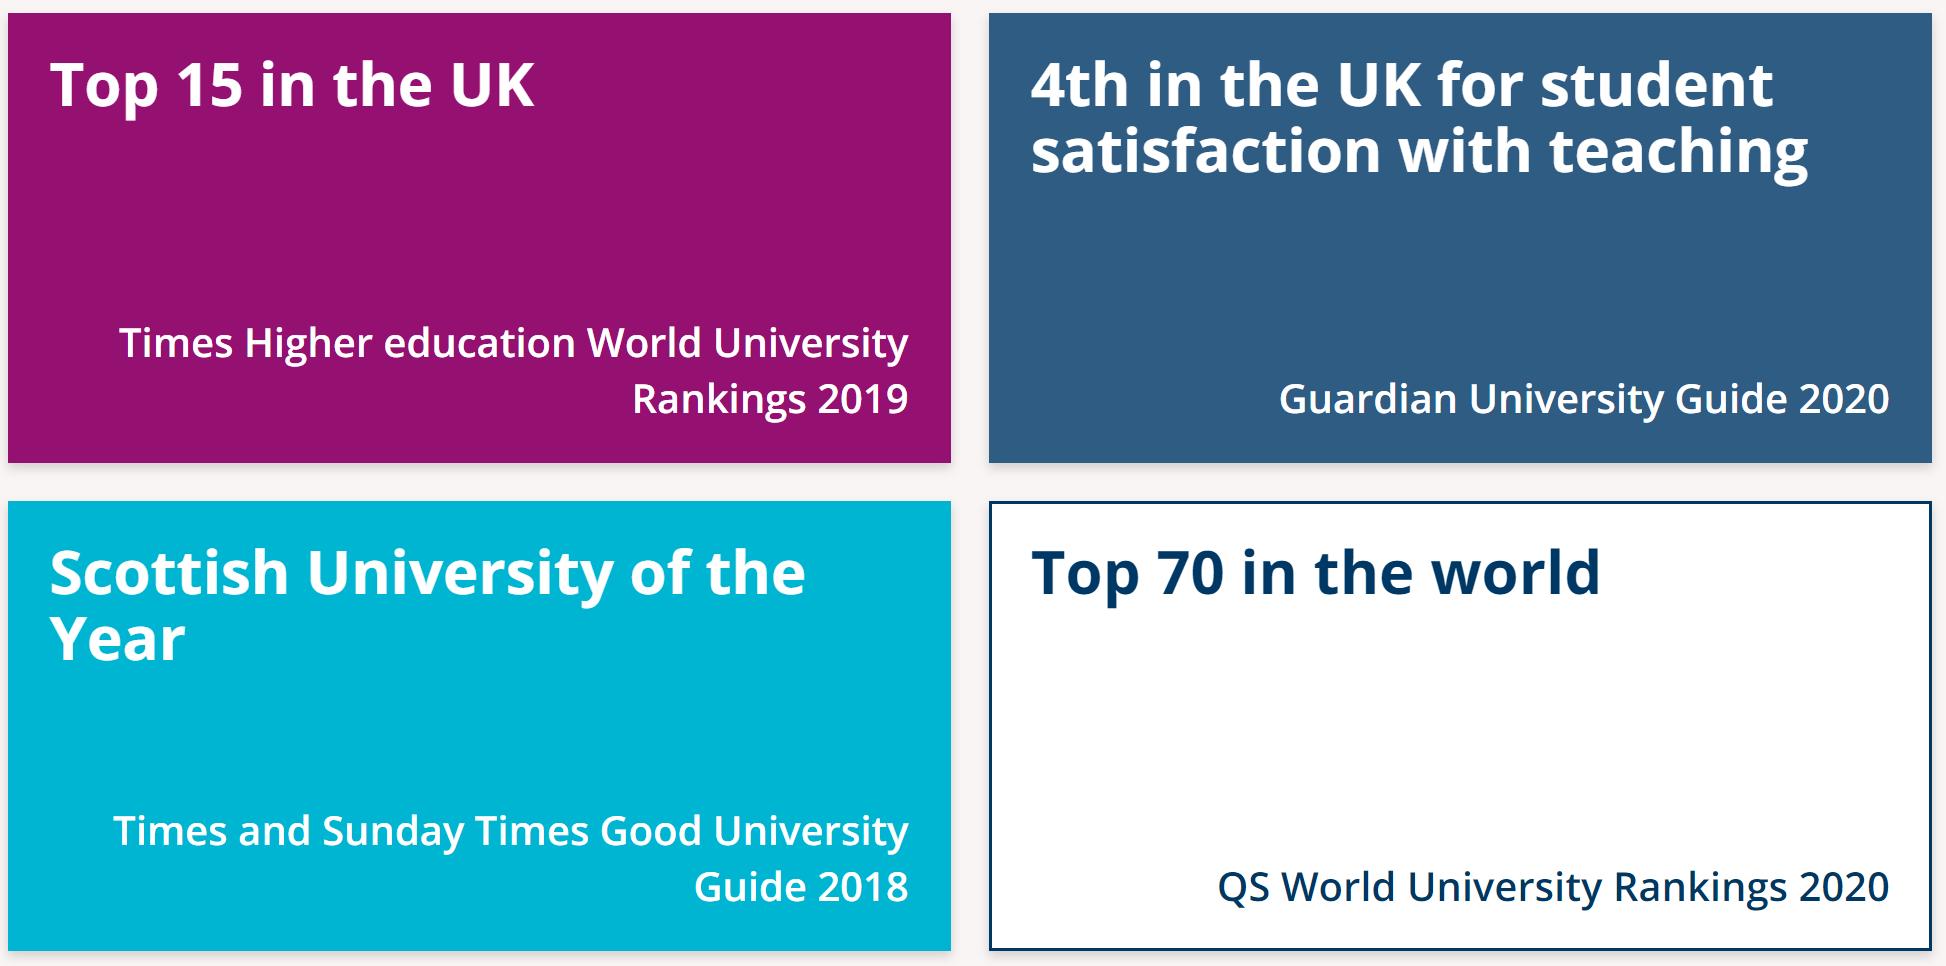 Taken from https://www.kaplanpathways.com/universities/university-of-glasgow/